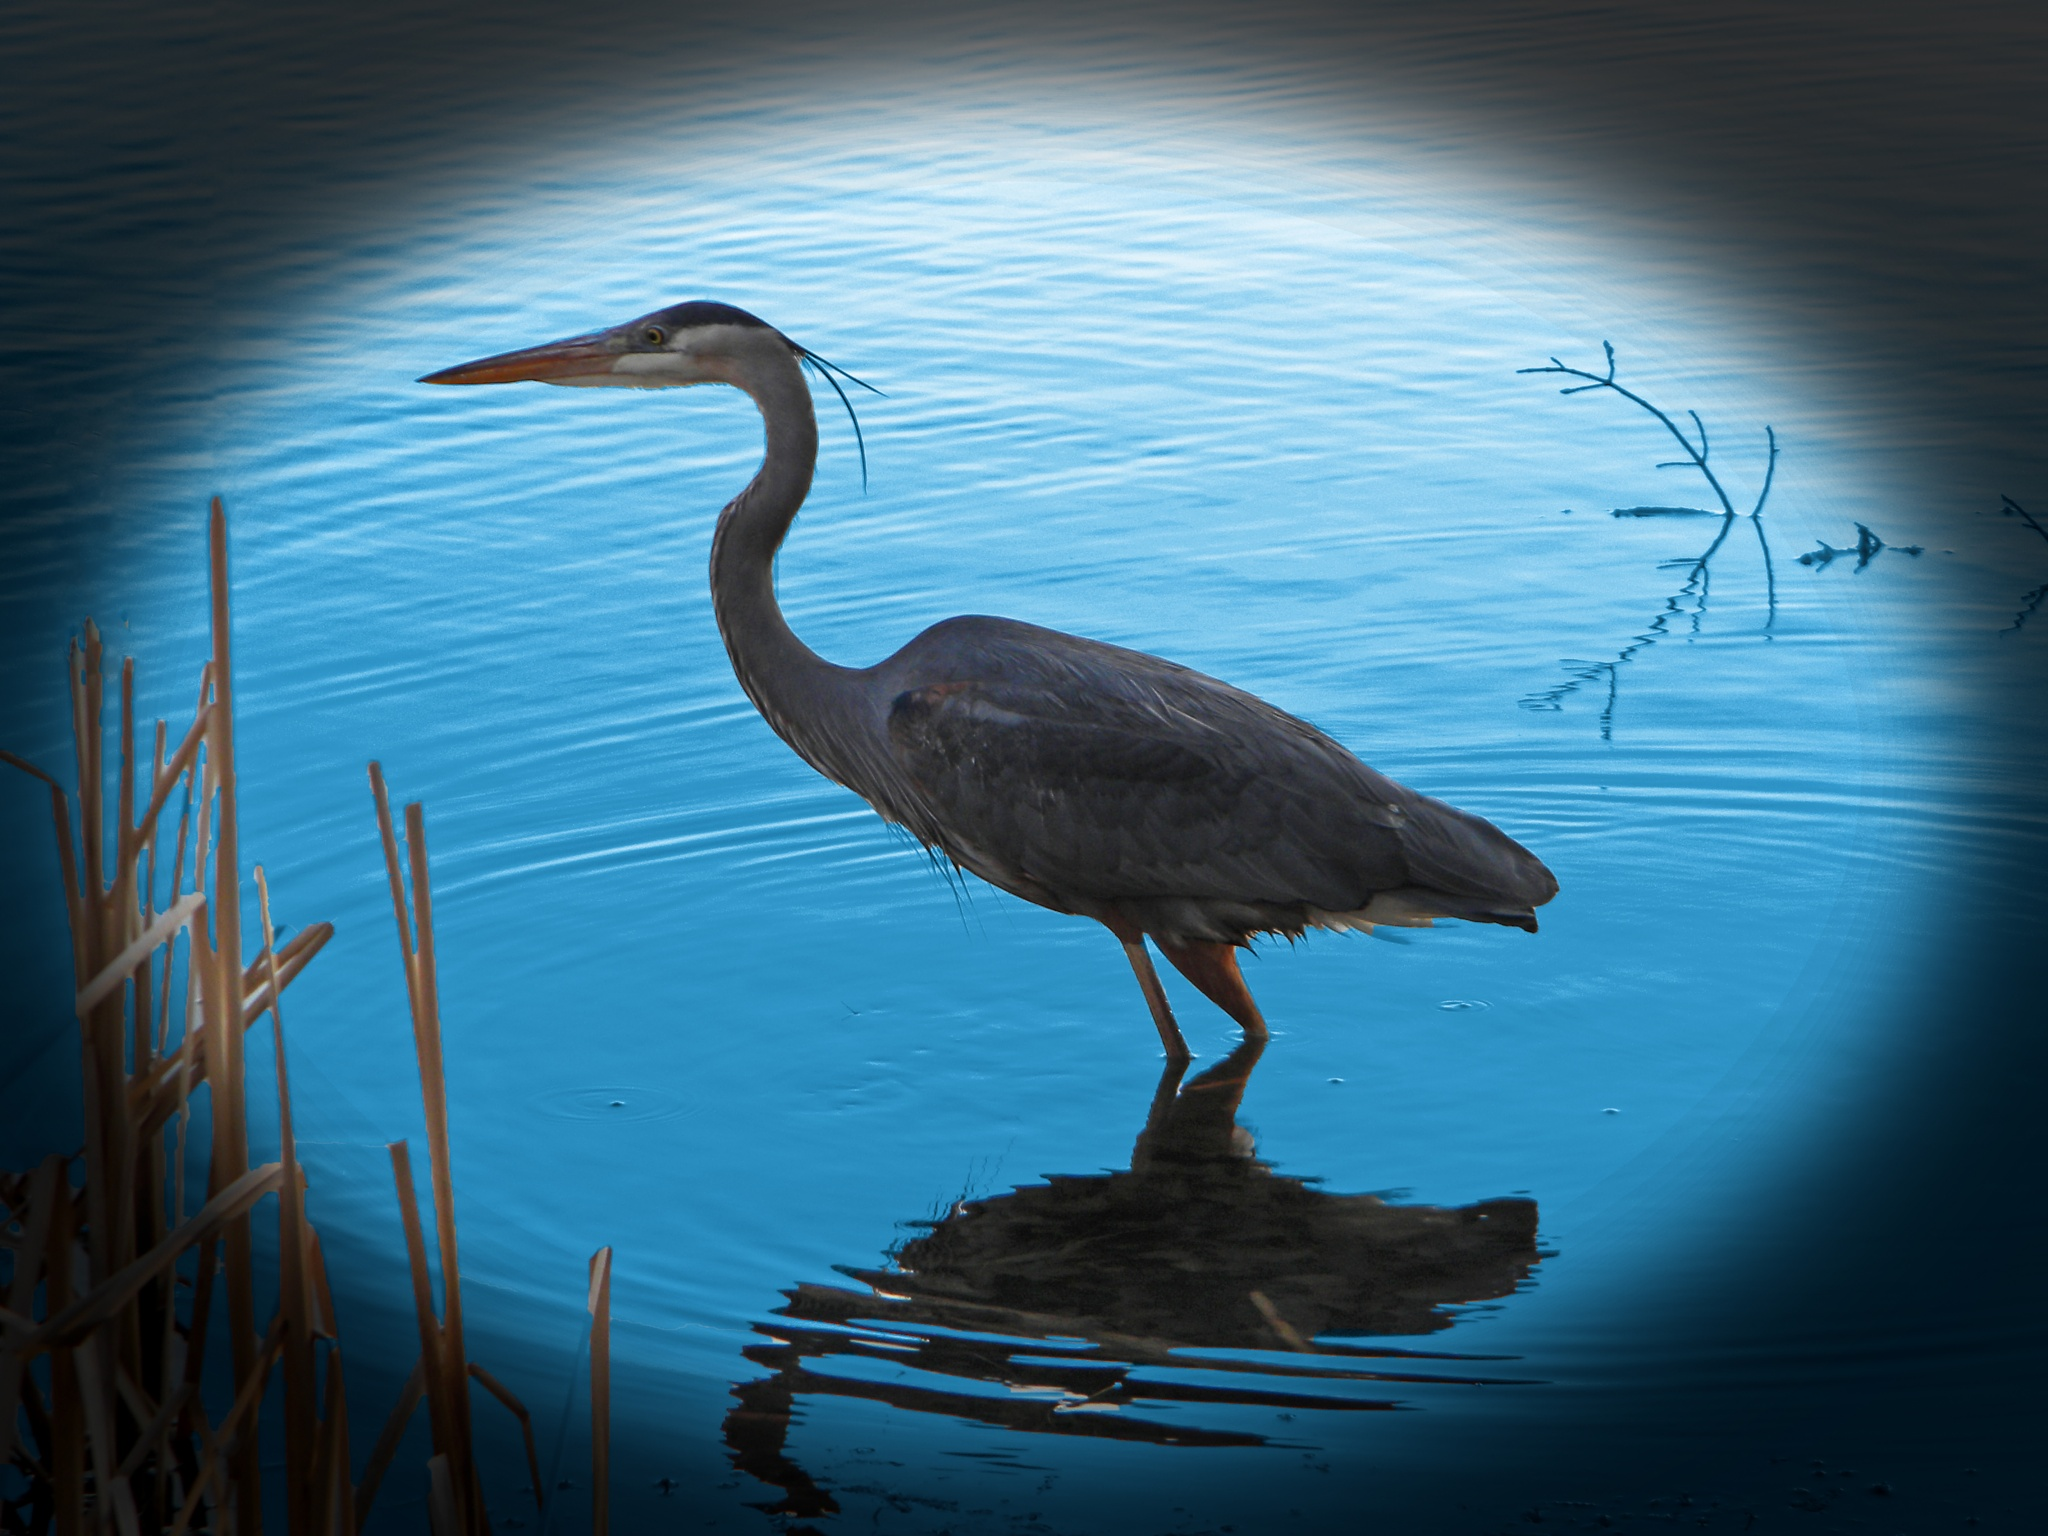 Great Blue Heron by Phillip W. Strunk